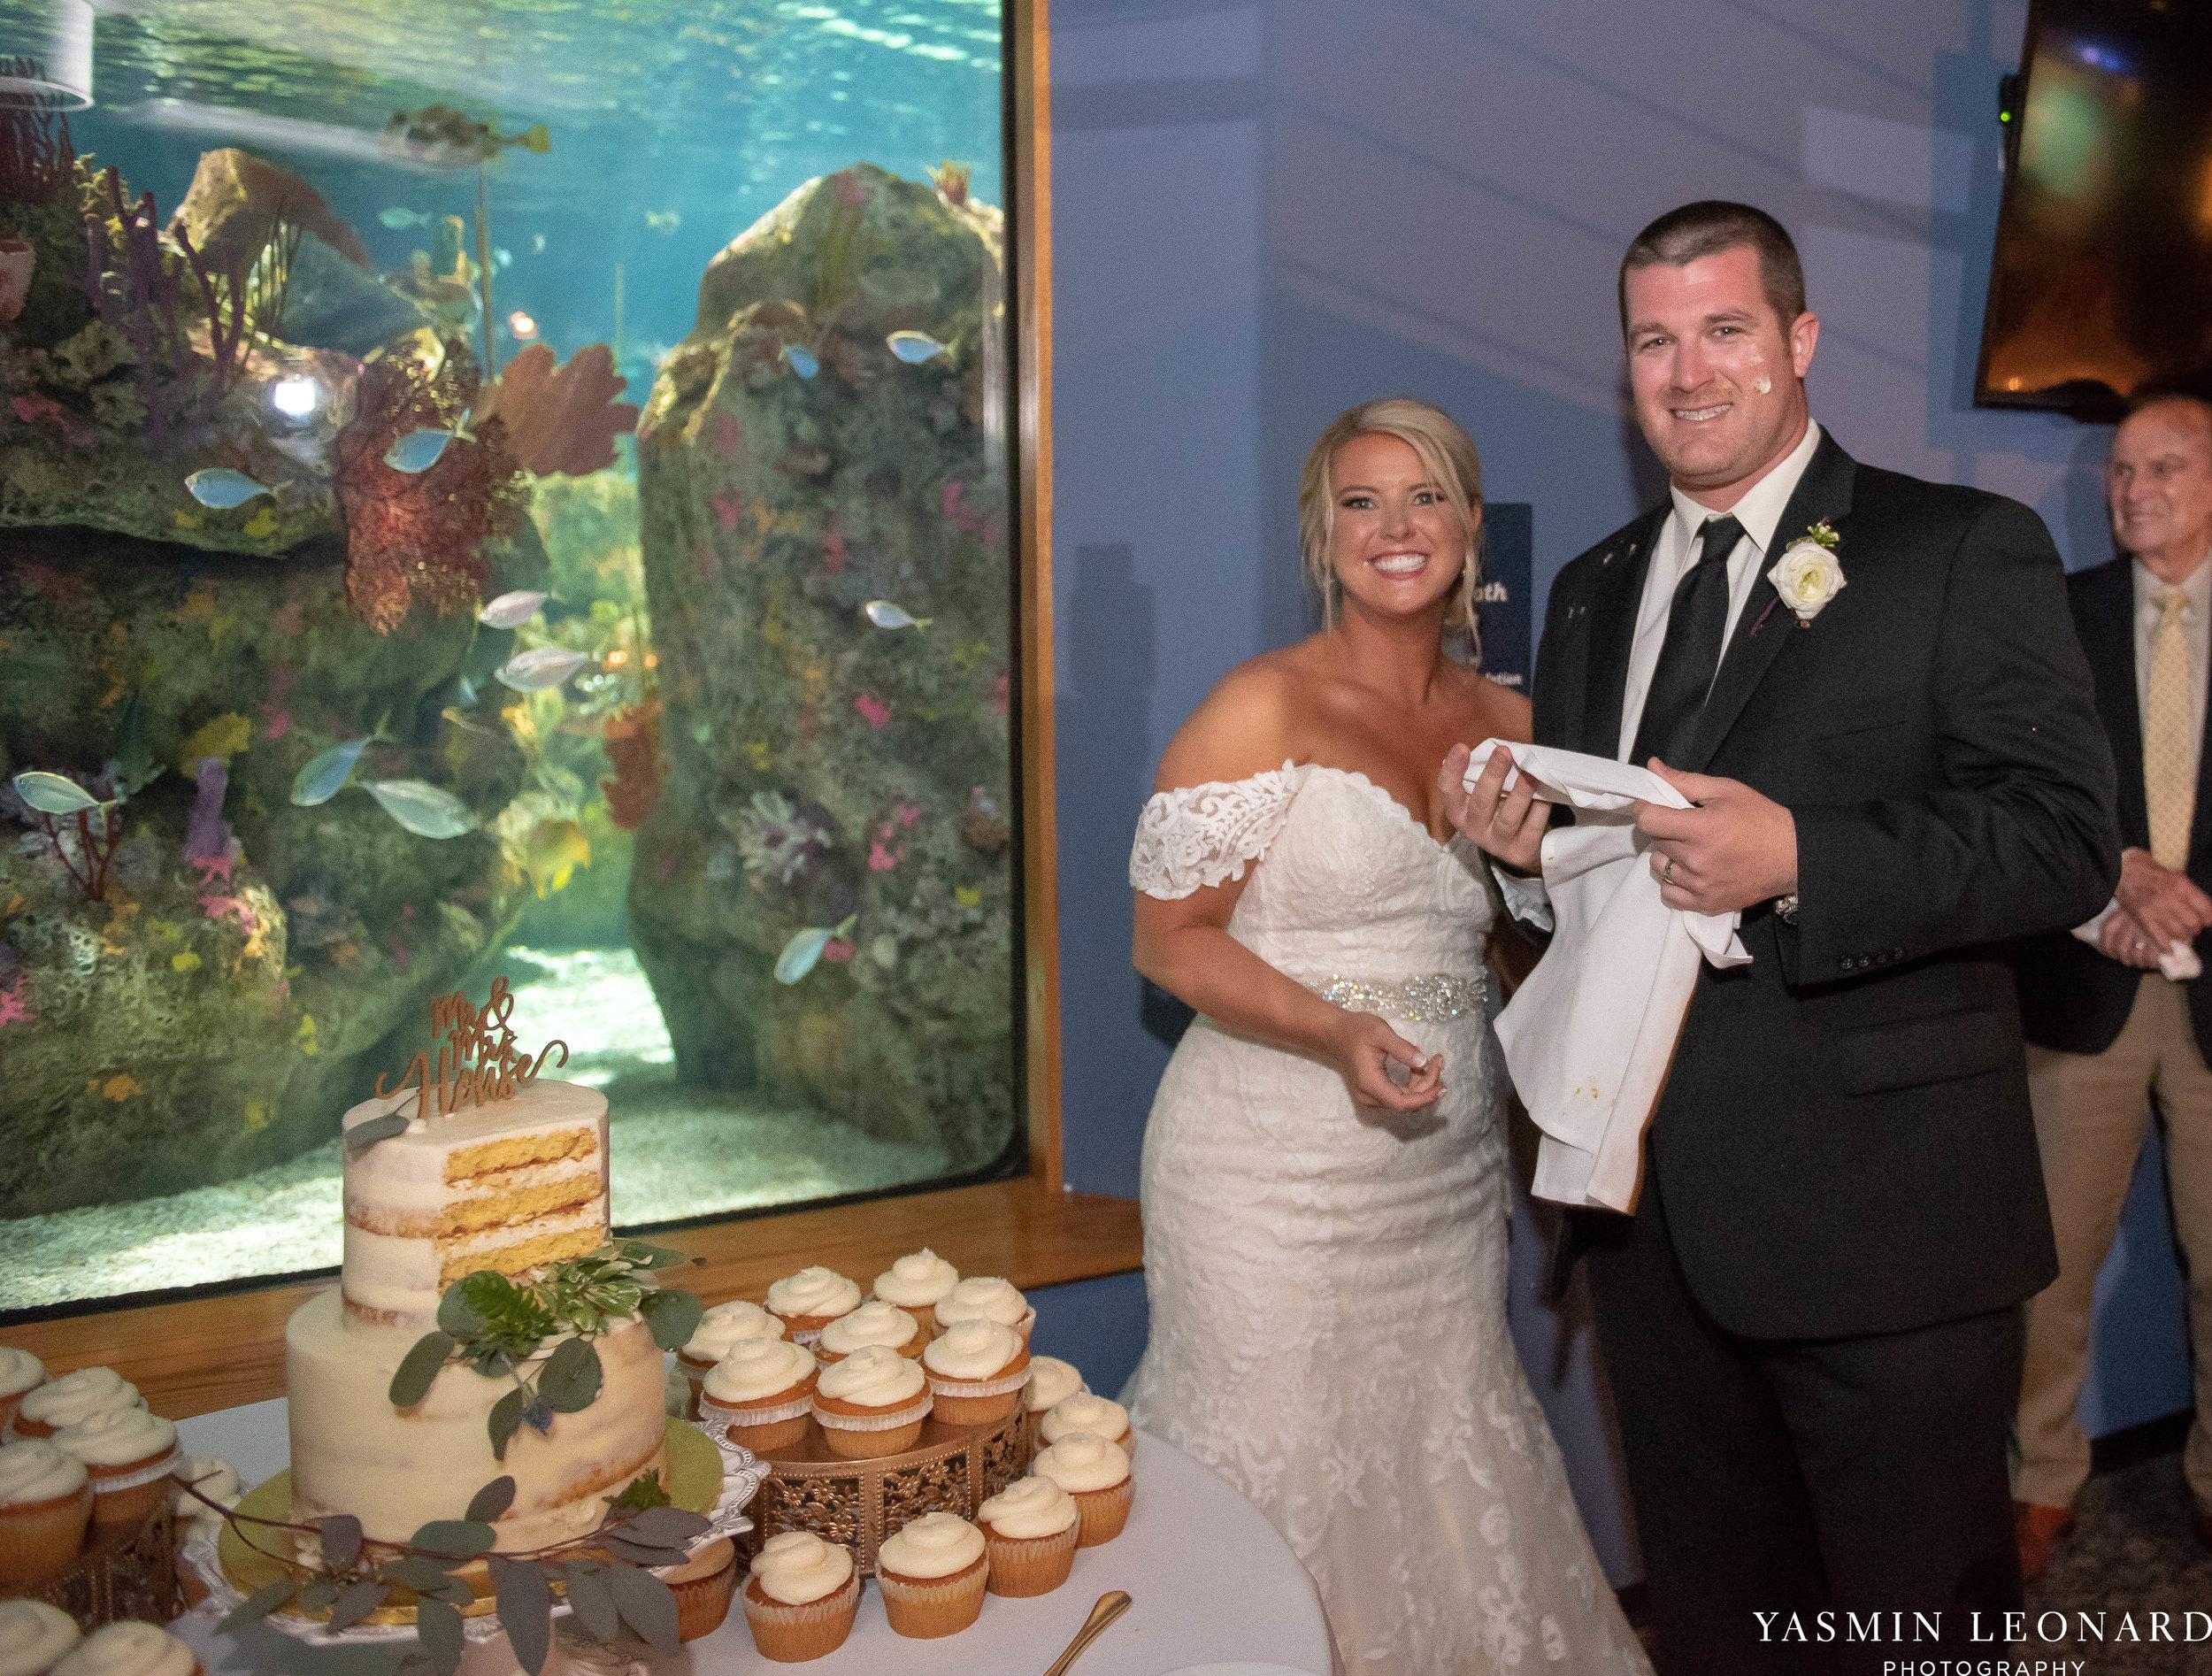 Carolina Beach Wedding - Fort Fisher Wedding - NC Acquarium - Beach Wedding - NC Wedding - Beach Wedding Inspiration - Beach Bride-53.jpg